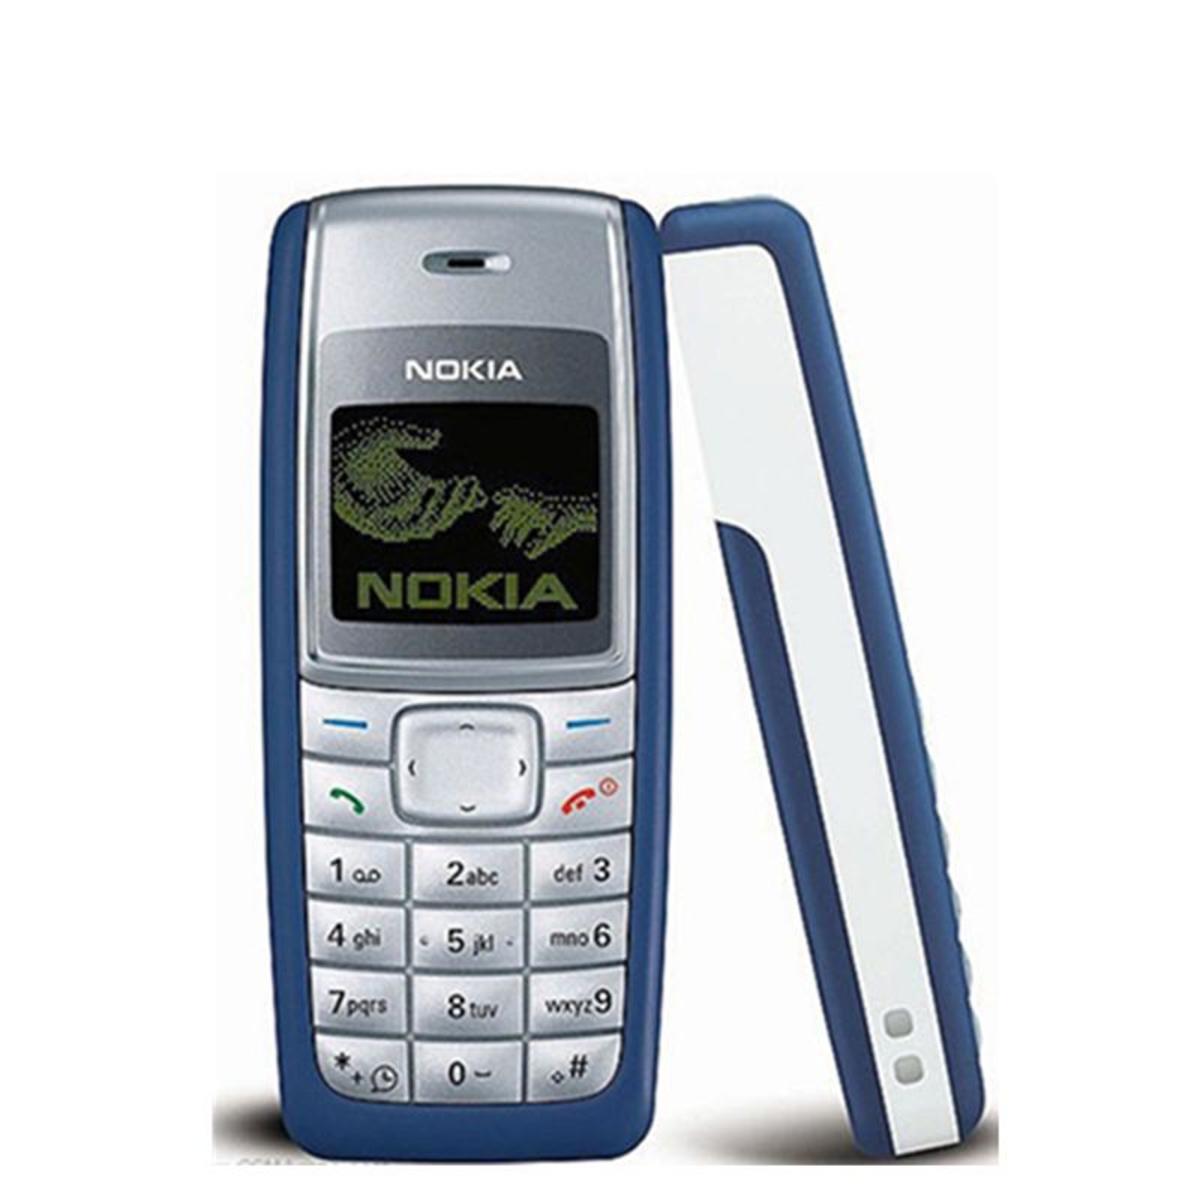 2G (Second generation) Phone